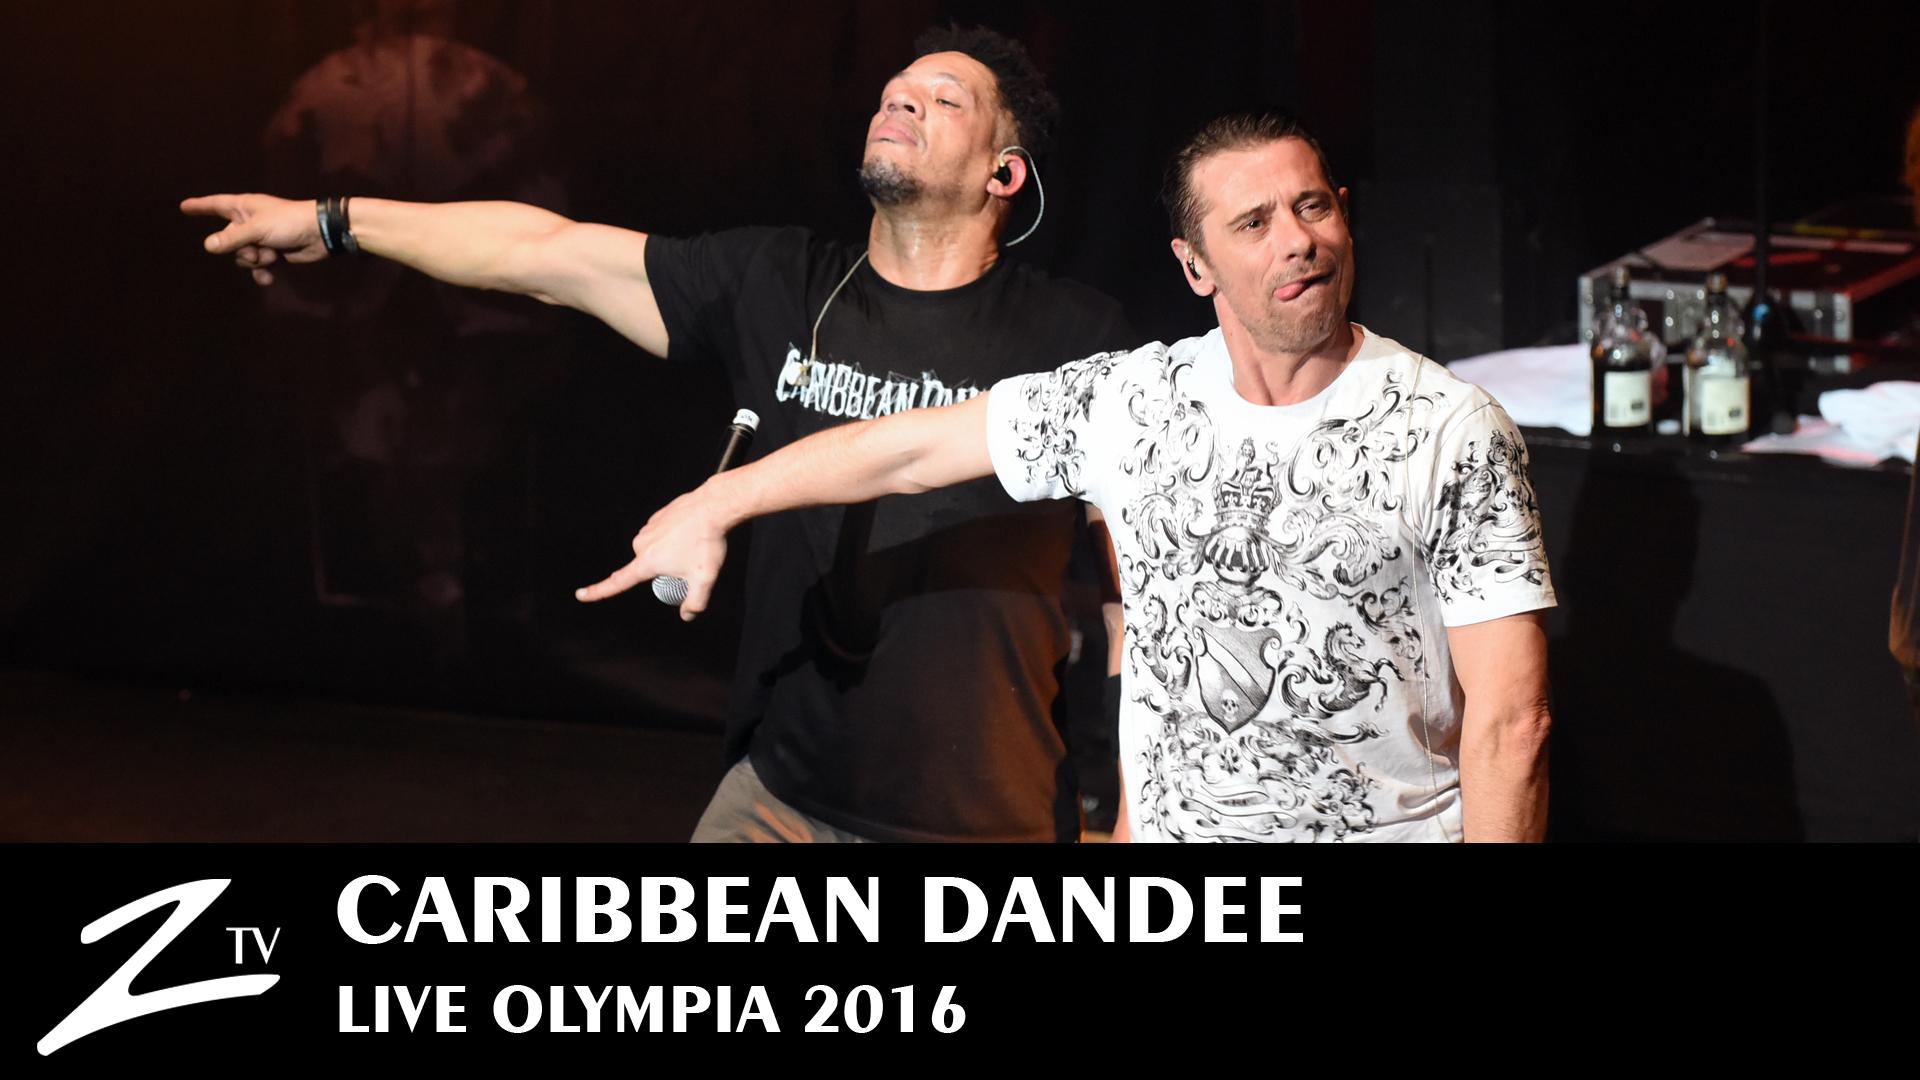 Vyoutube-Caribbean-Dandee-2